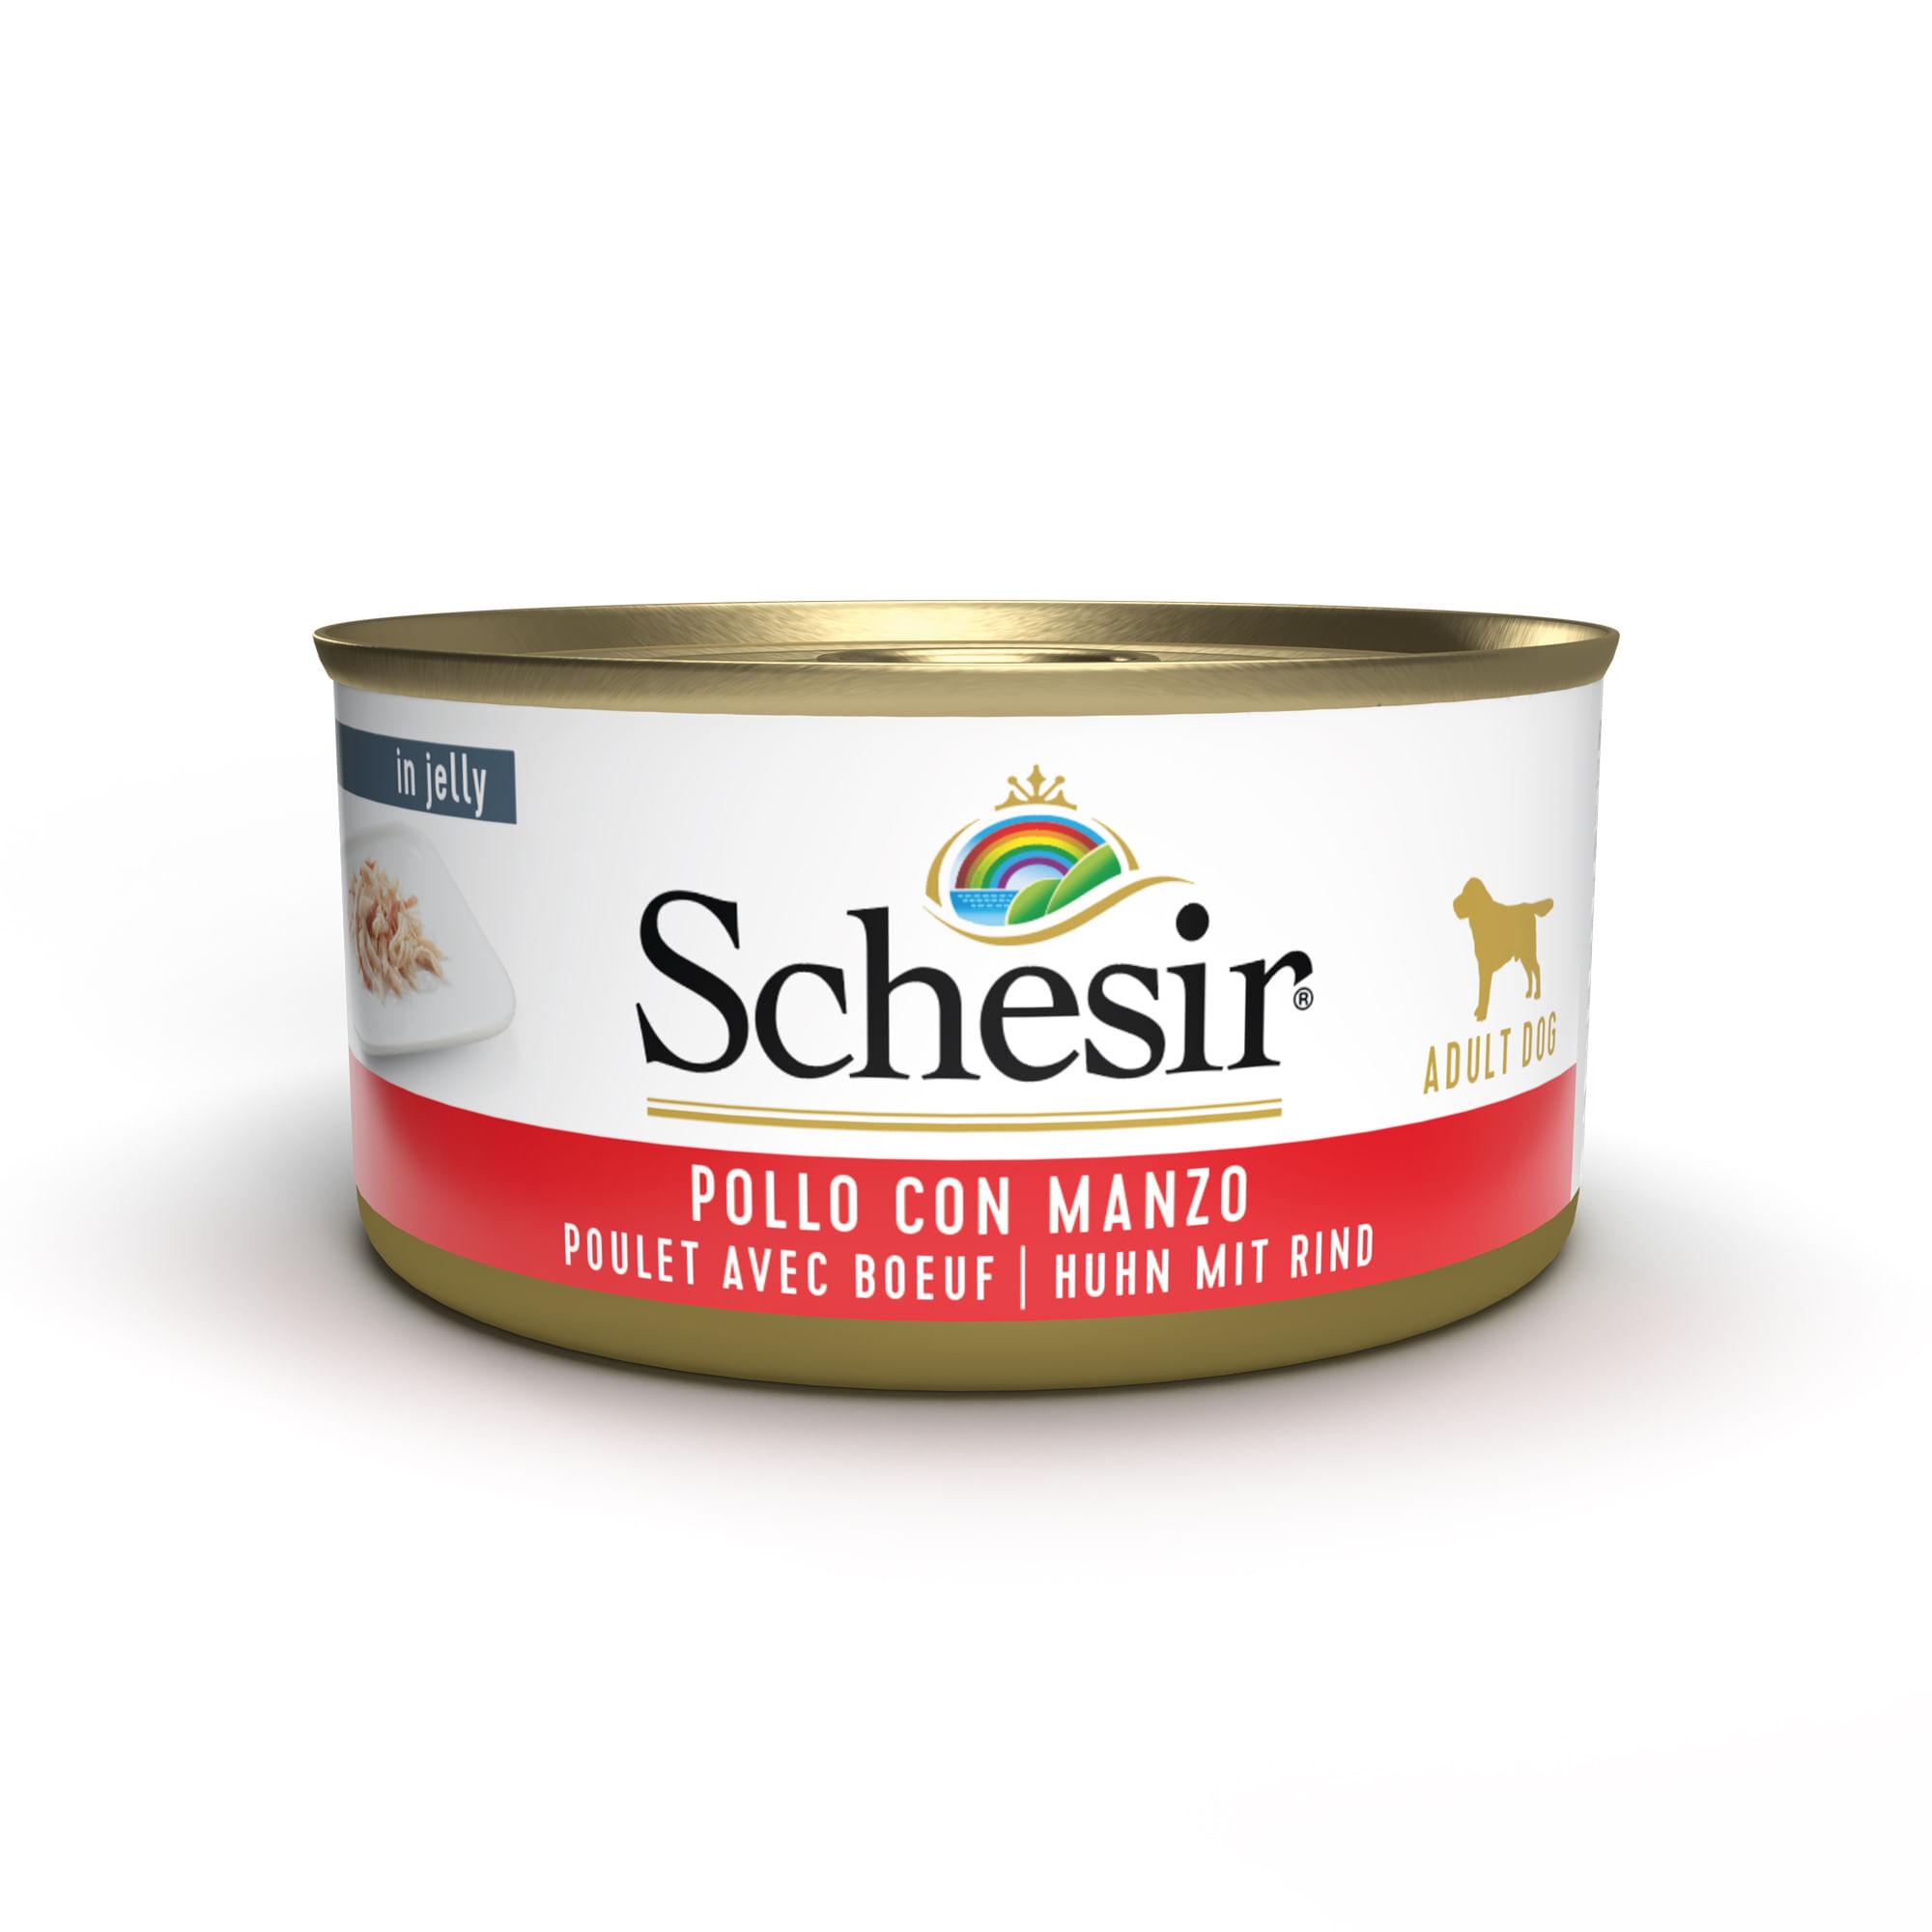 SCHESIR Dog Pollo con Manzo in Jelly 150G